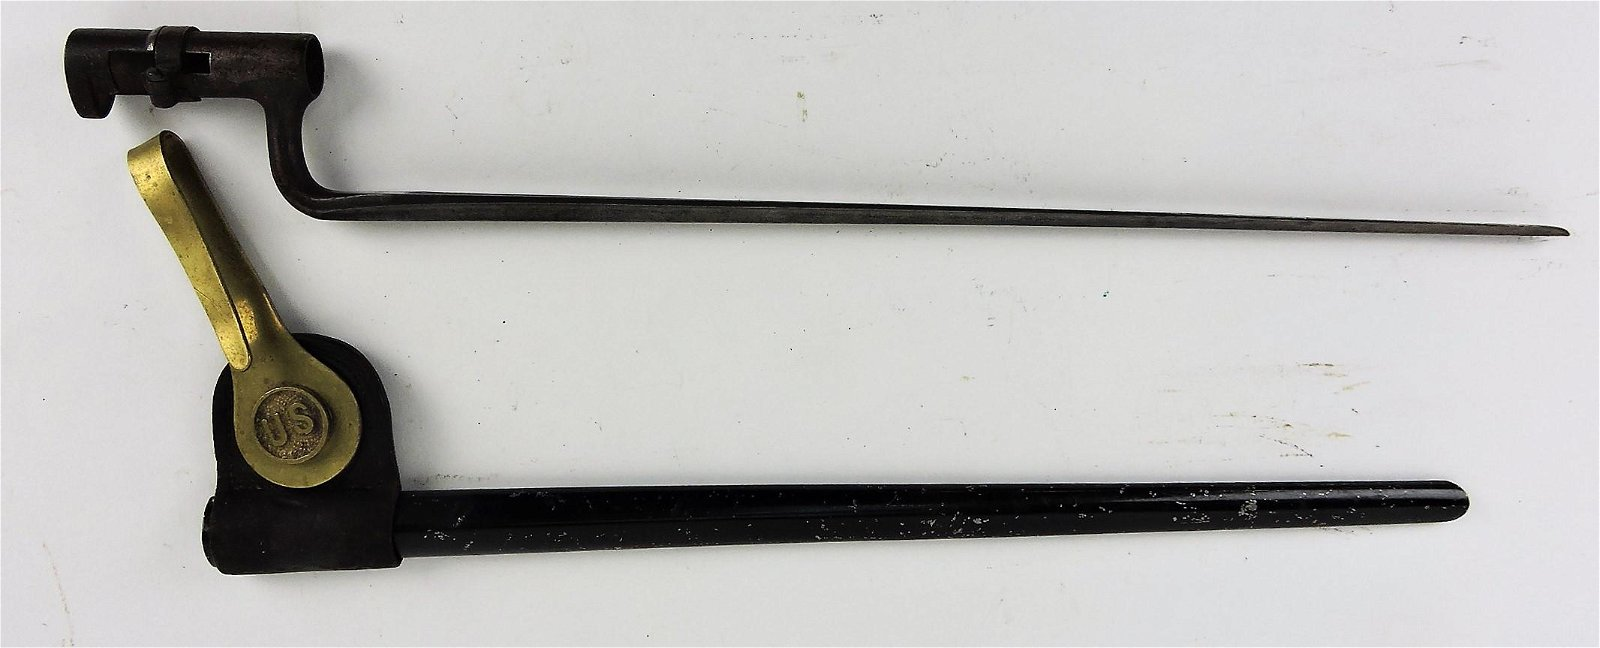 US Cavalry Civil War bayonet and